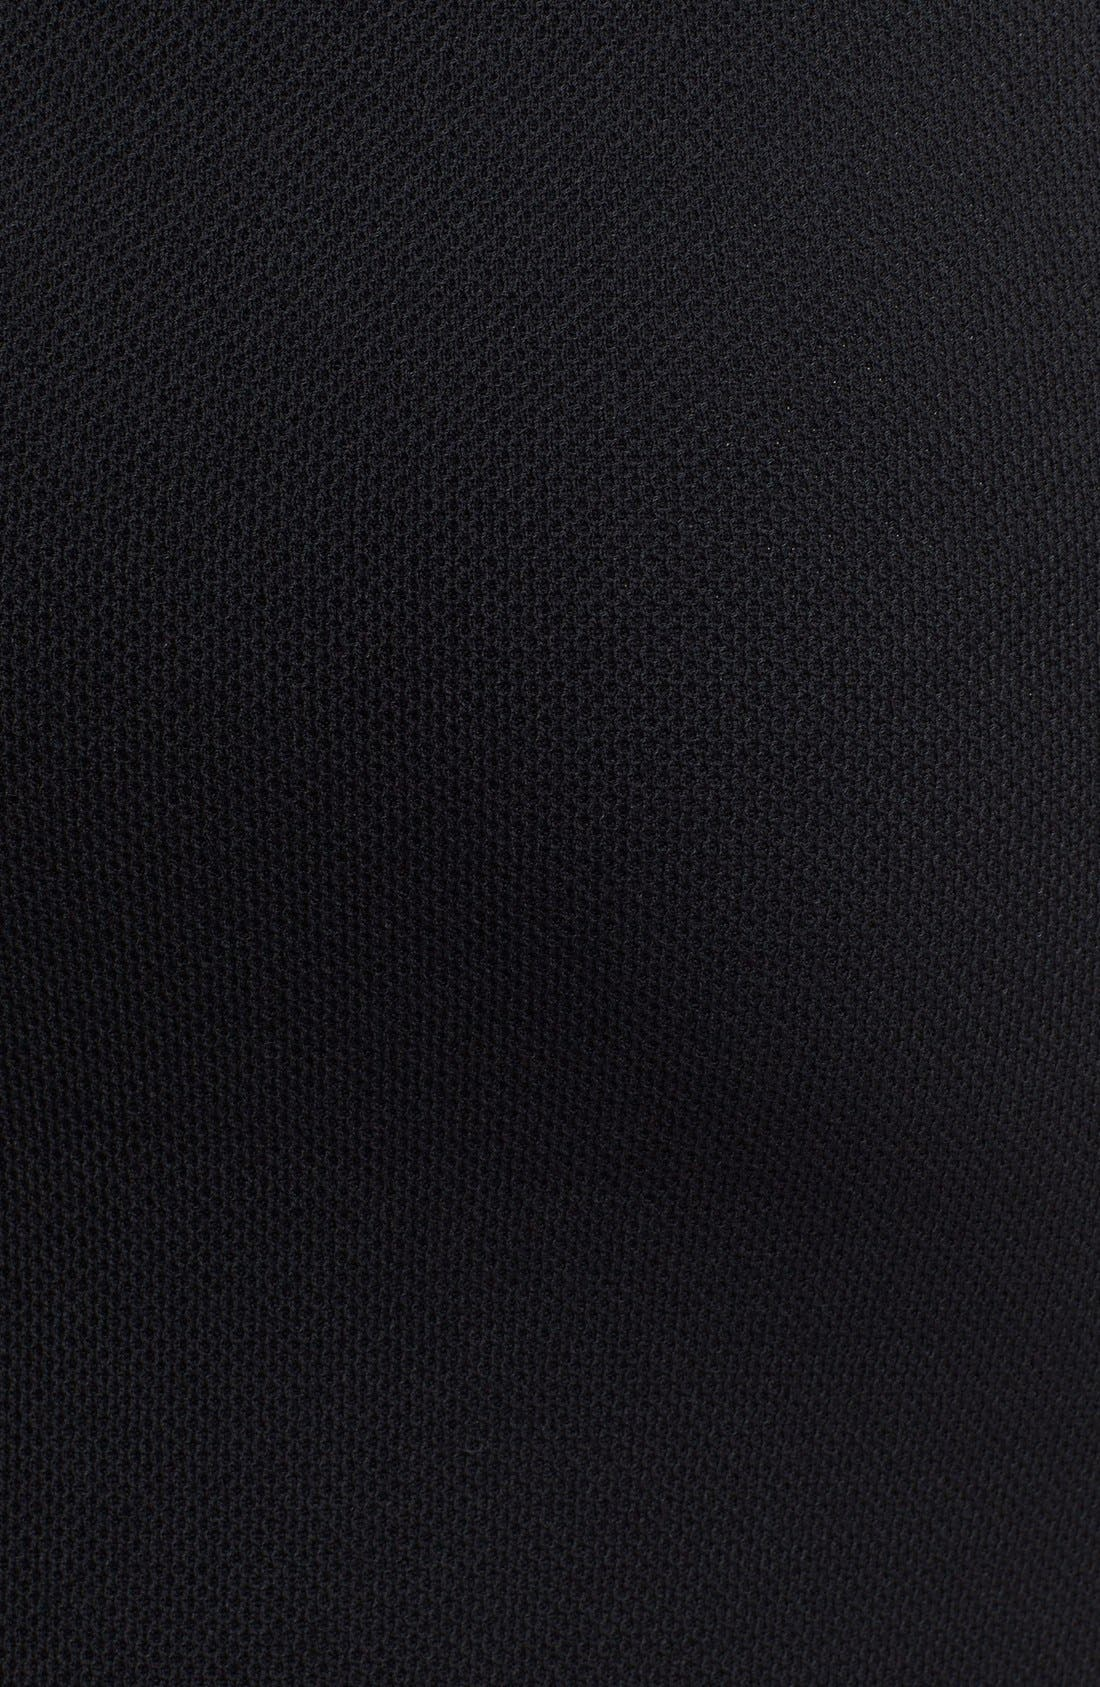 Milano Piqué Knit Pencil Skirt,                             Alternate thumbnail 4, color,                             001